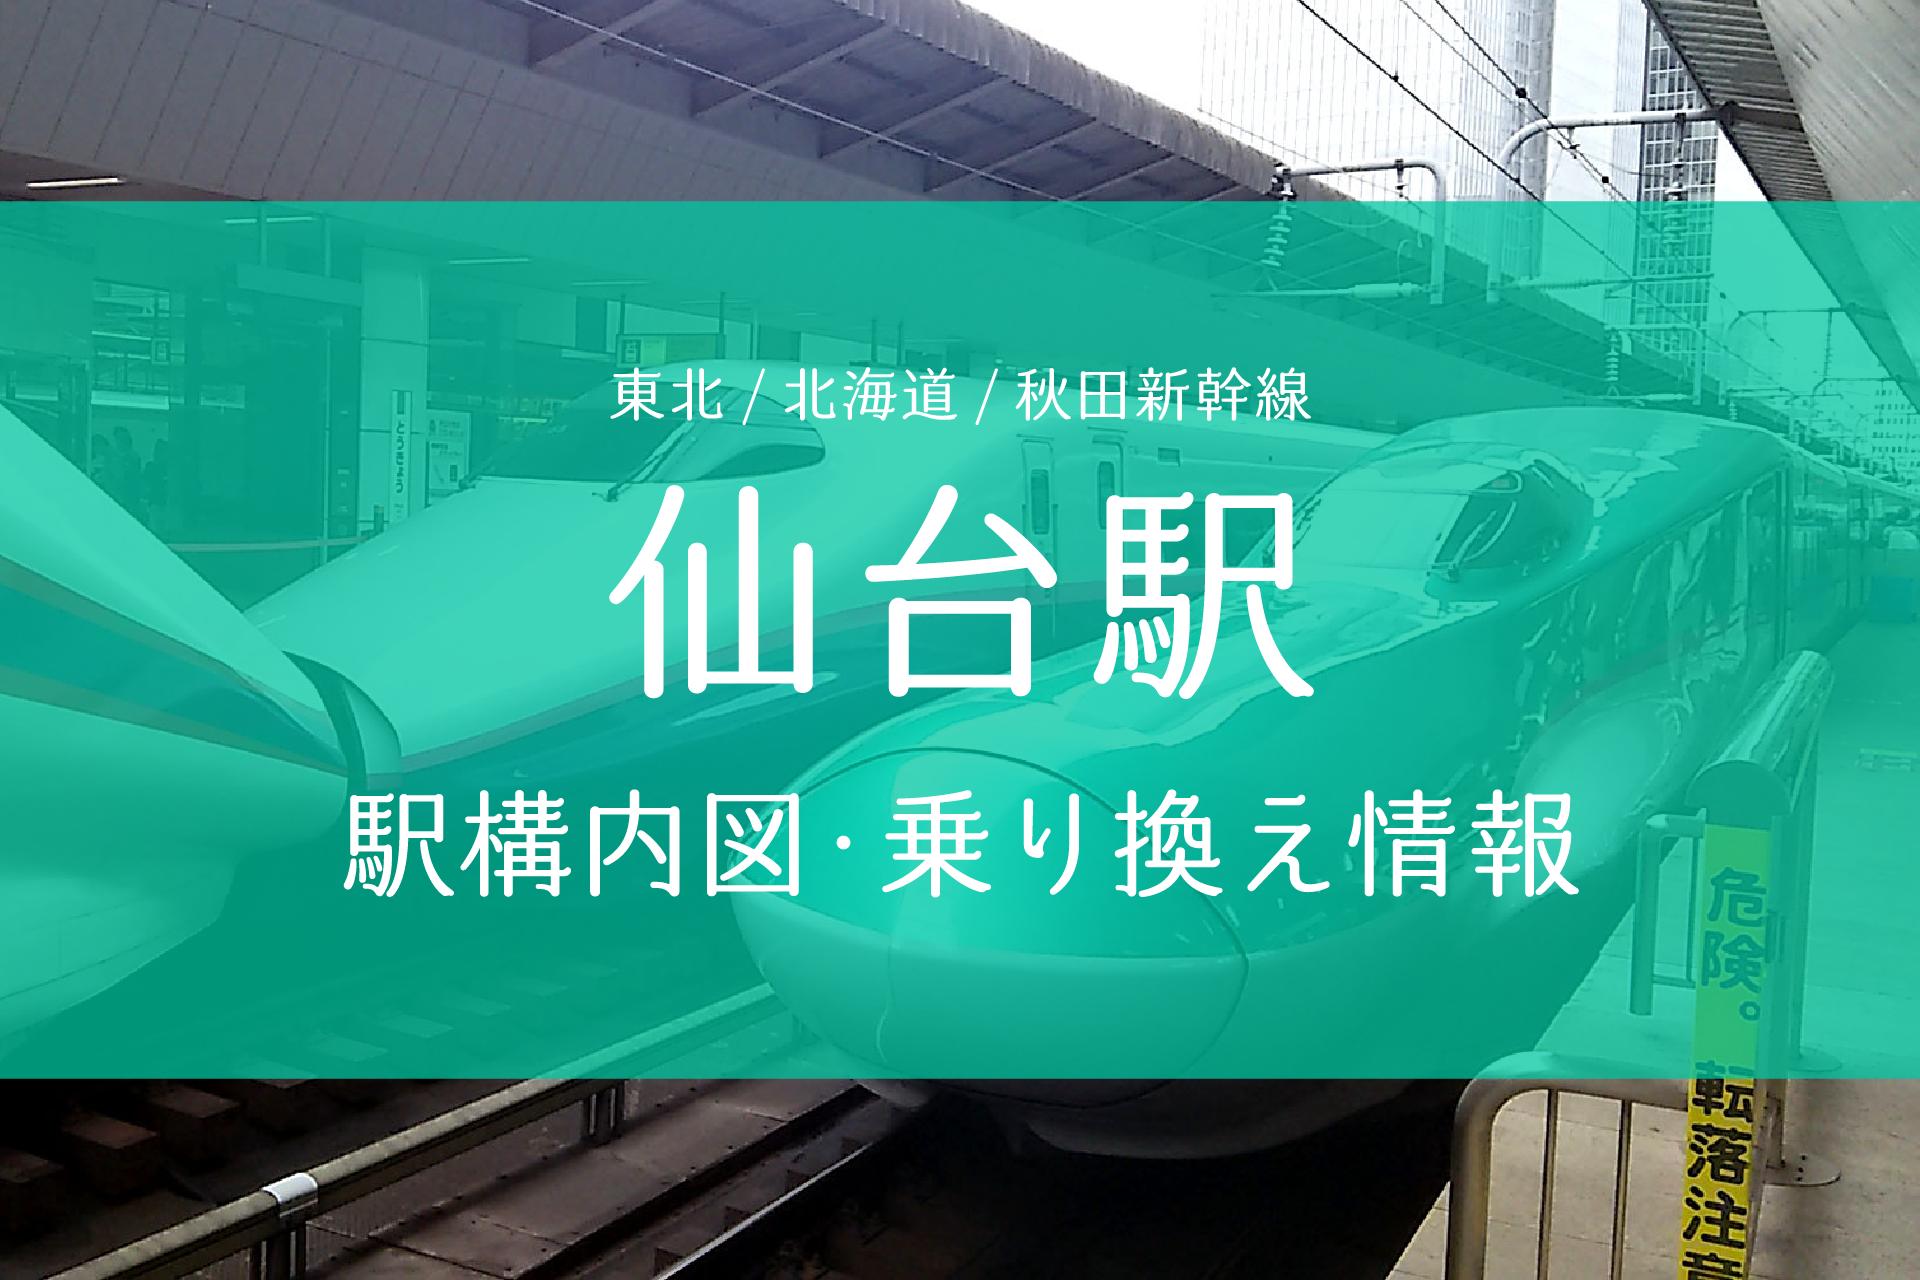 仙台駅構内図・乗り換え情報